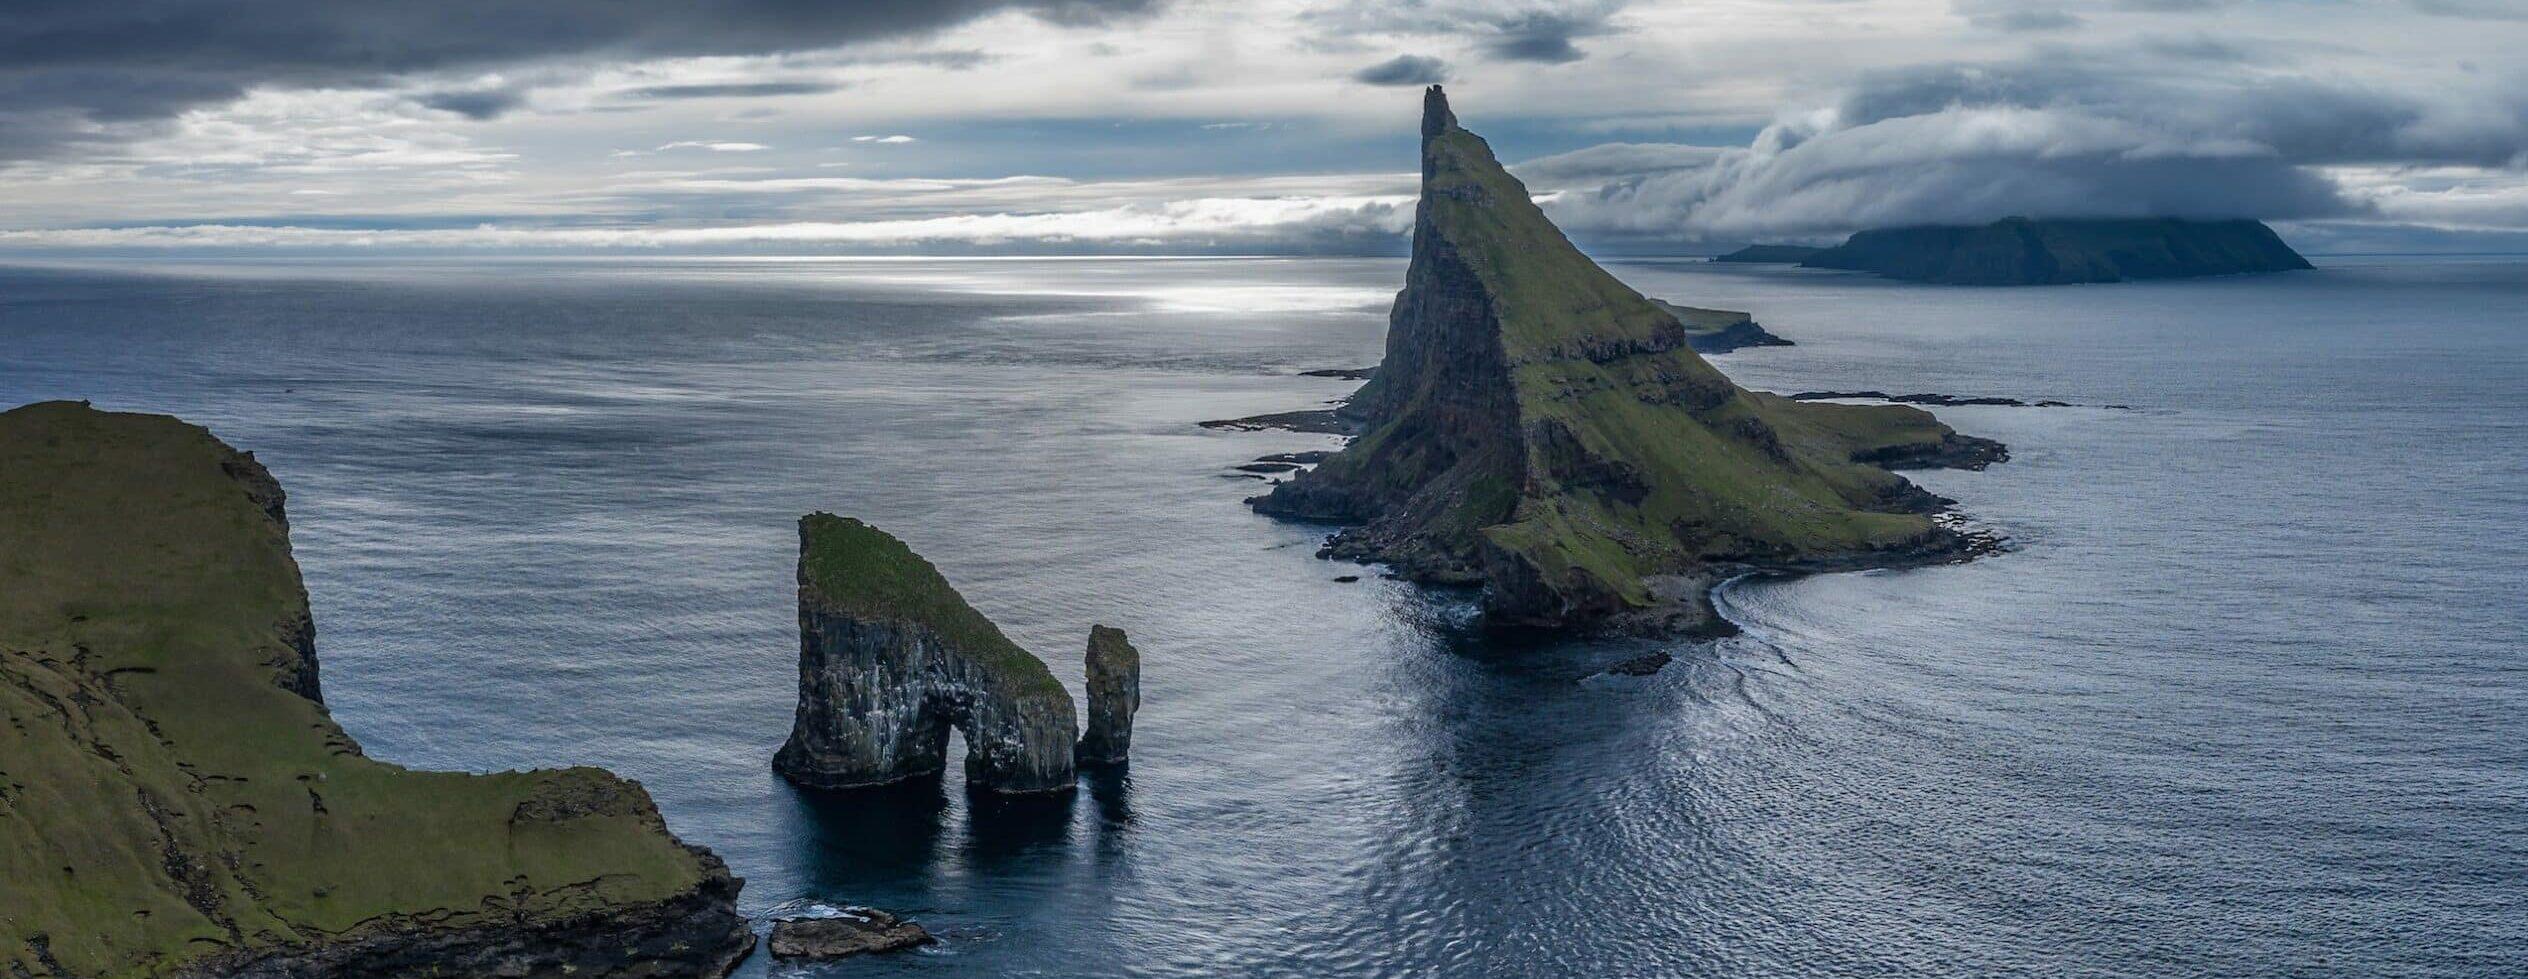 Drangarnir - Guide to Faroe Islands